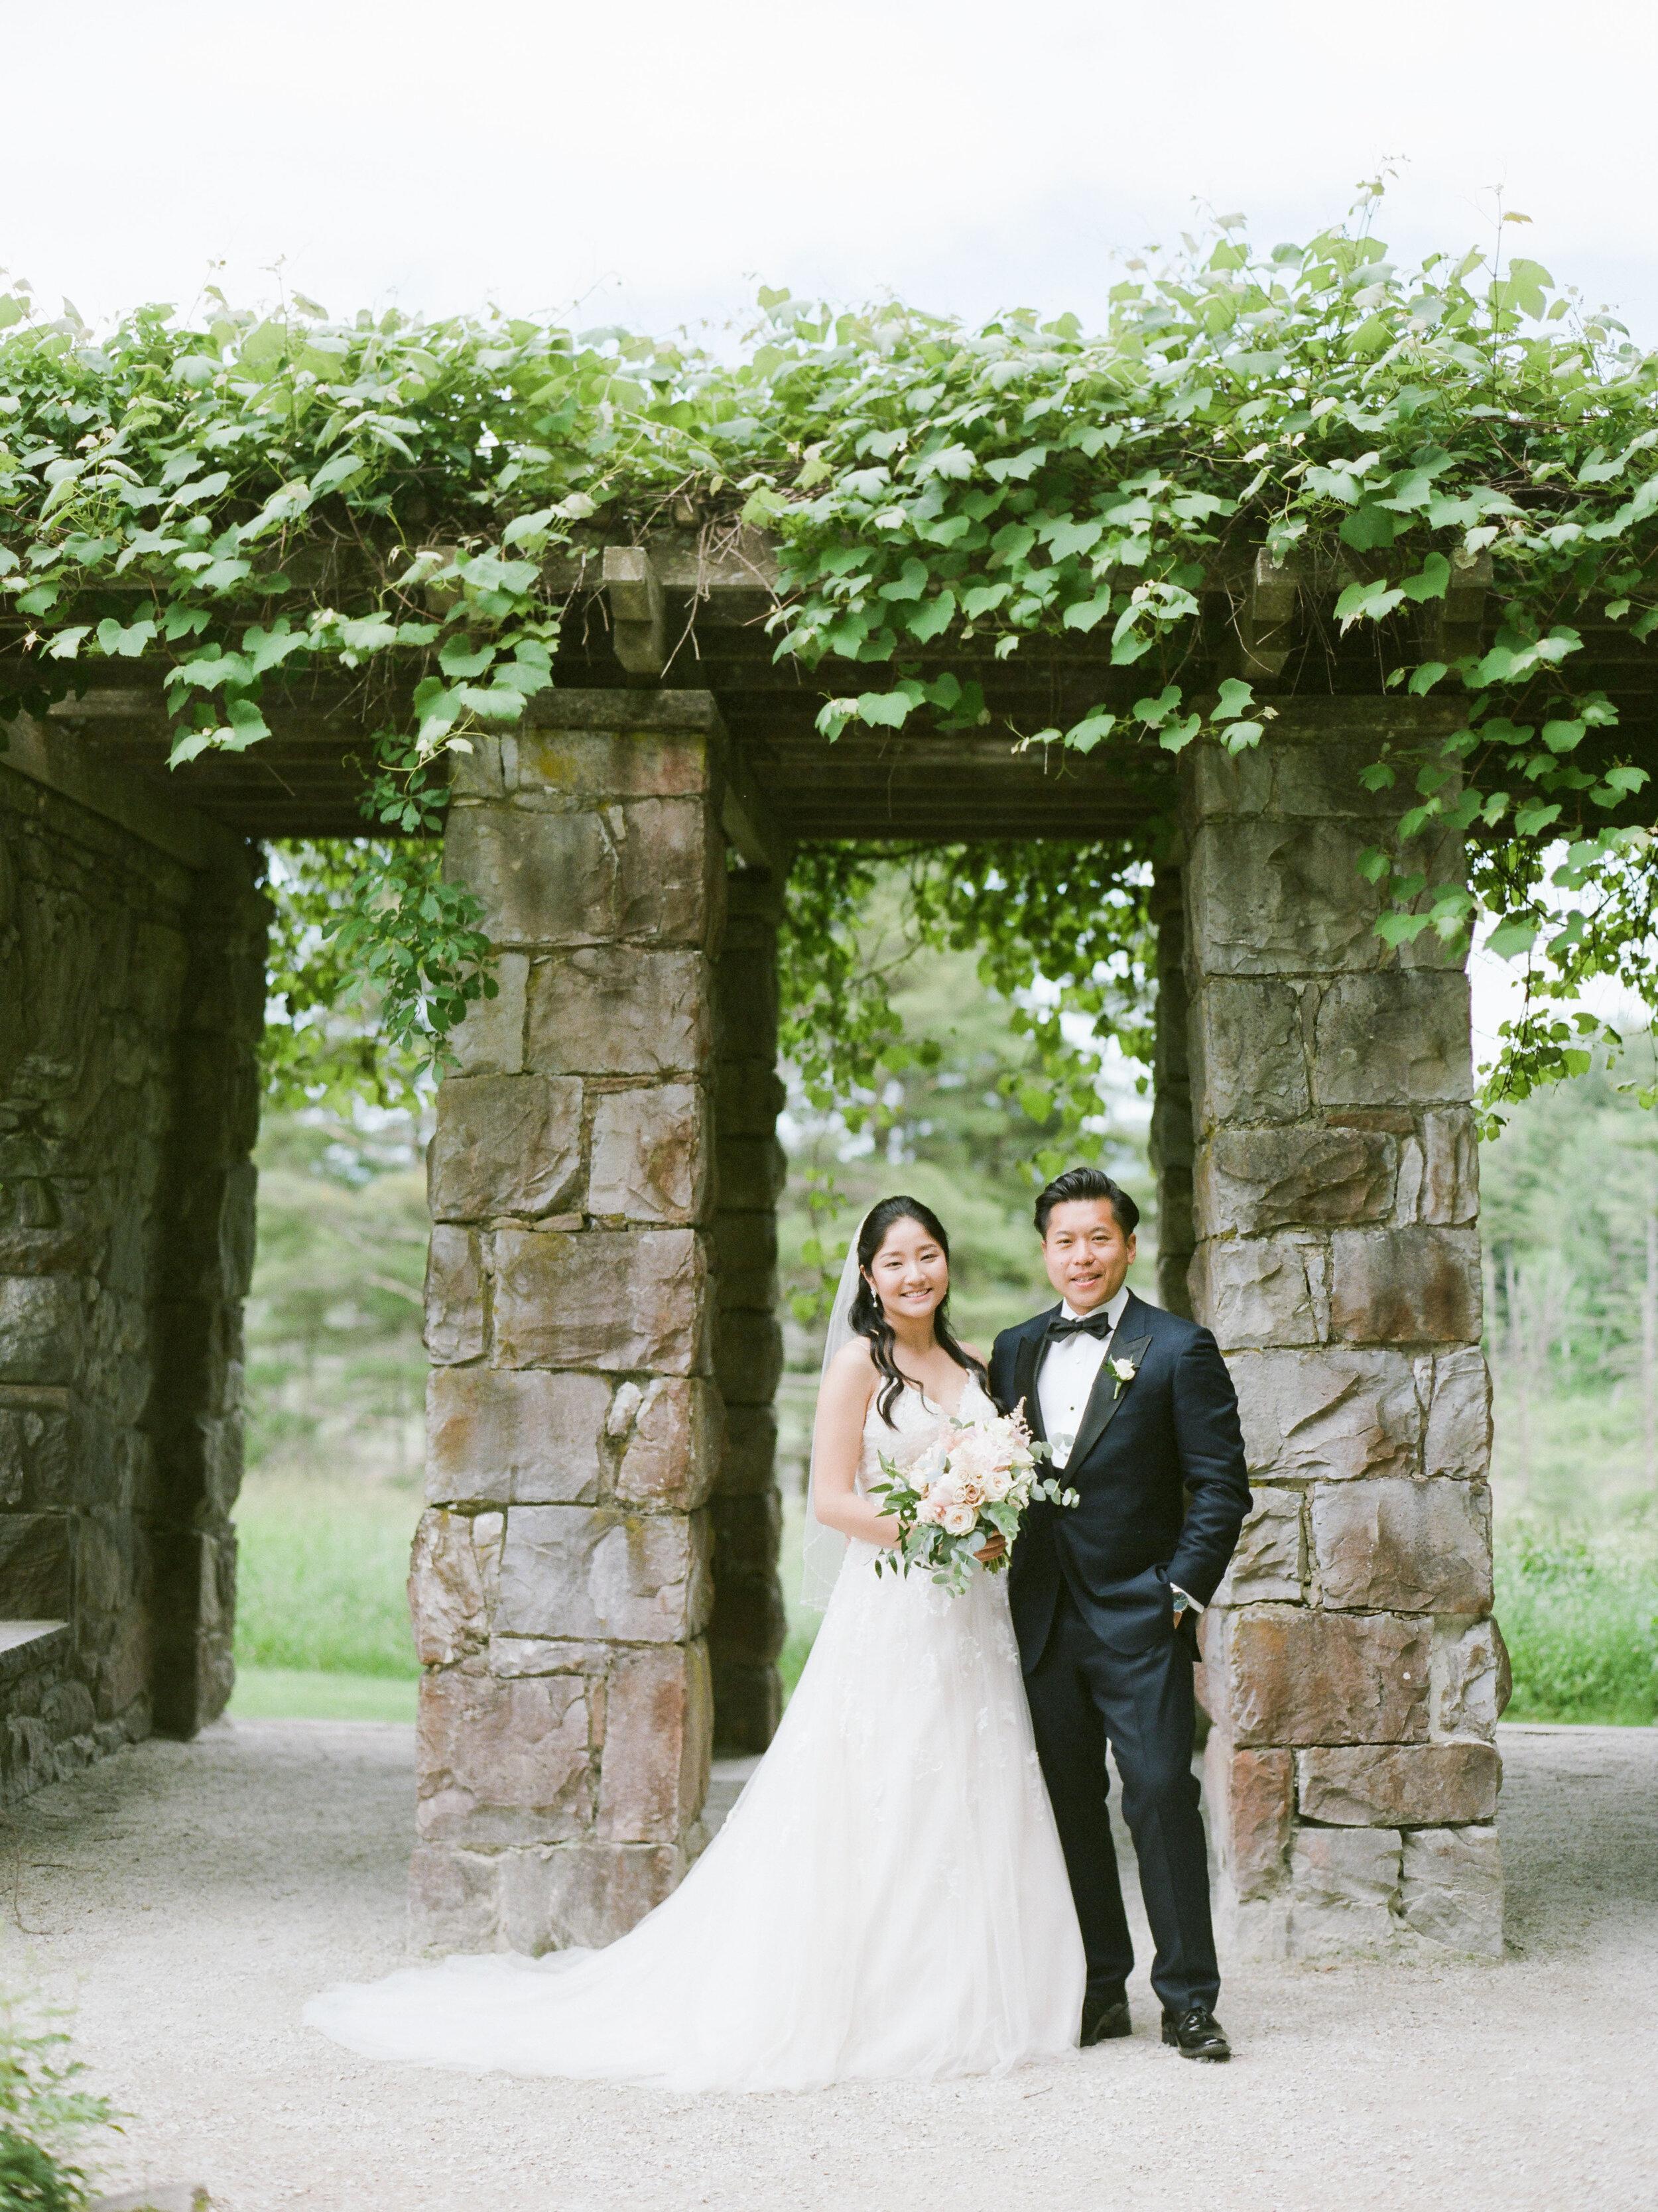 Wedding Photographer in Western MA